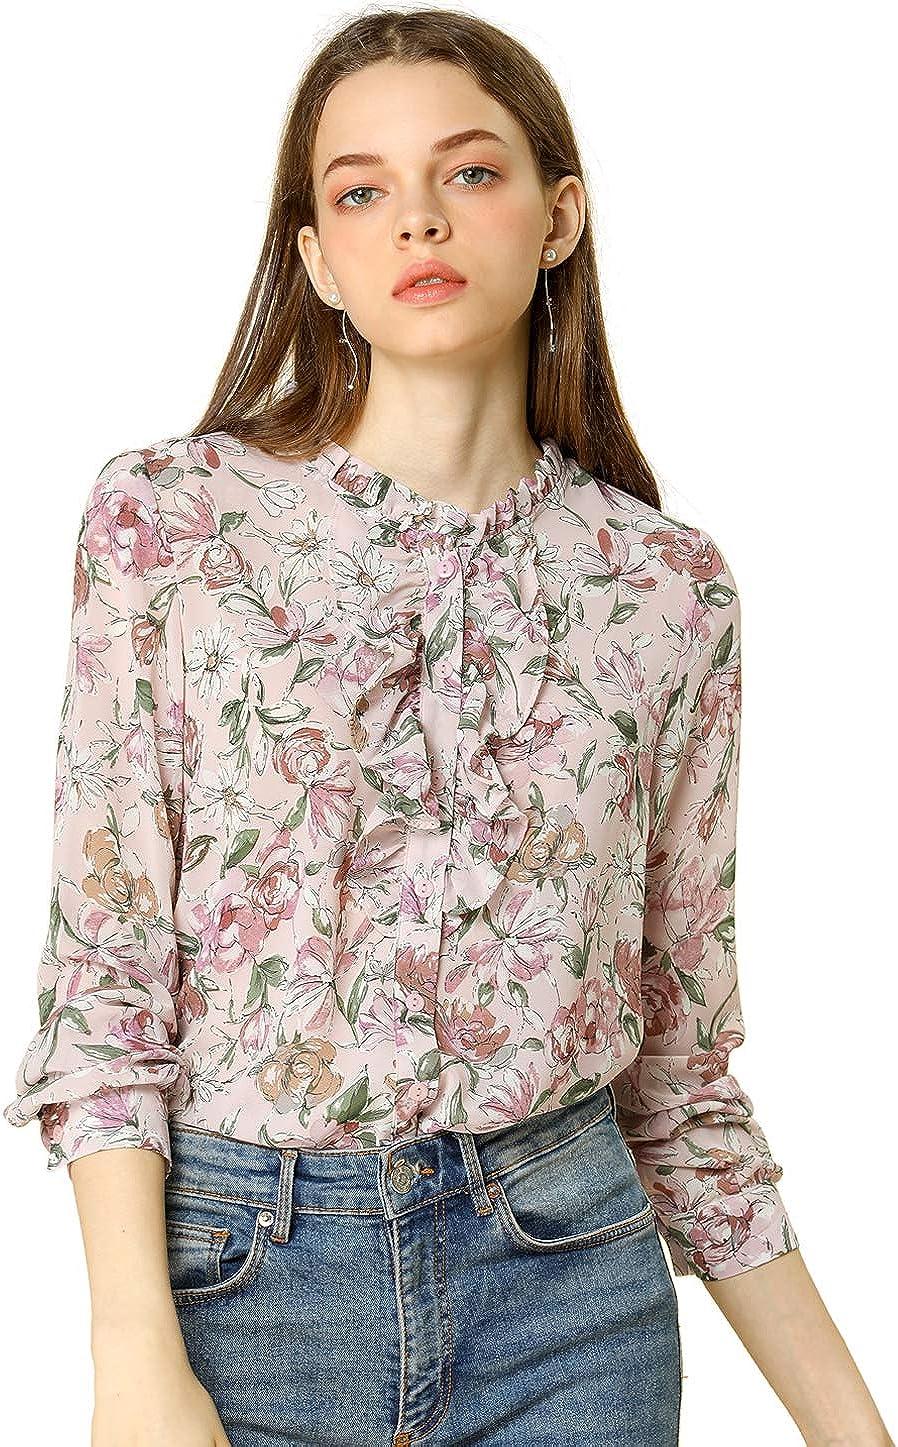 Allegra K Women's Ruffled Chiffon Floral Blouse Retro Long Sleeve Button Down Ruffle Collar Neck Shirt Top